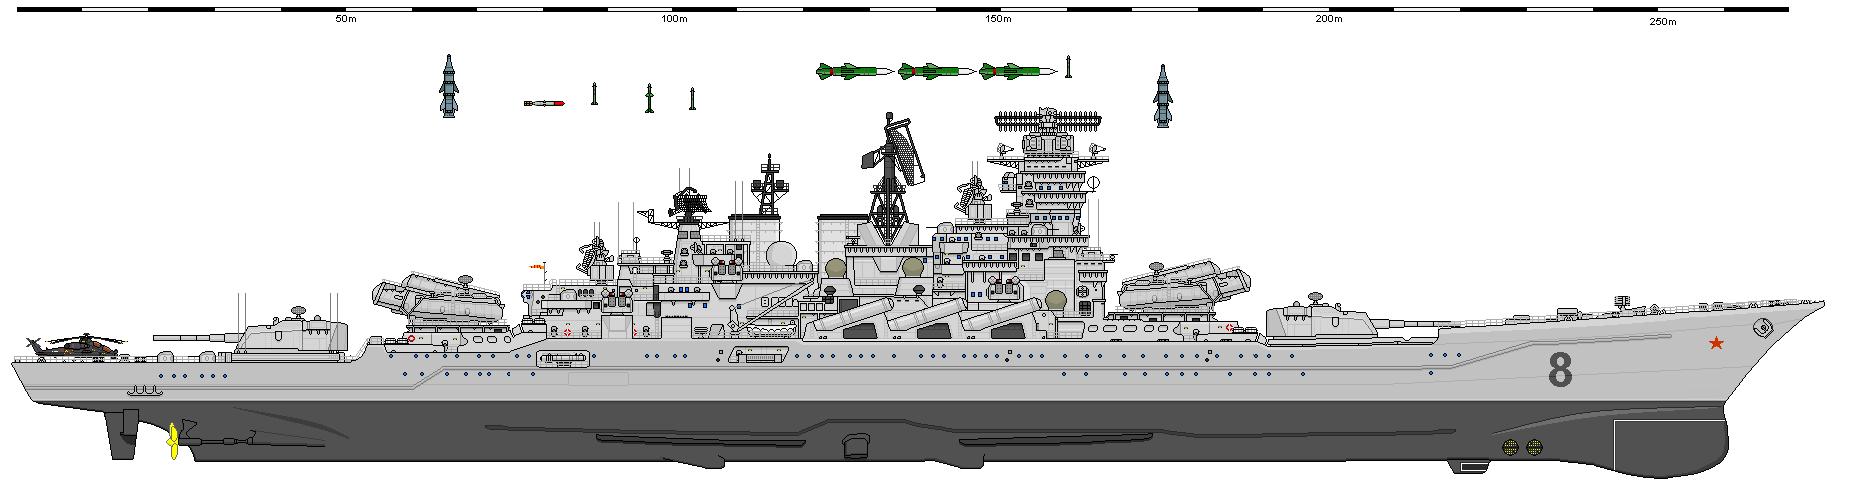 soviet_communist_cruiser_force_by_kara_alvama-d3l5pqn.png